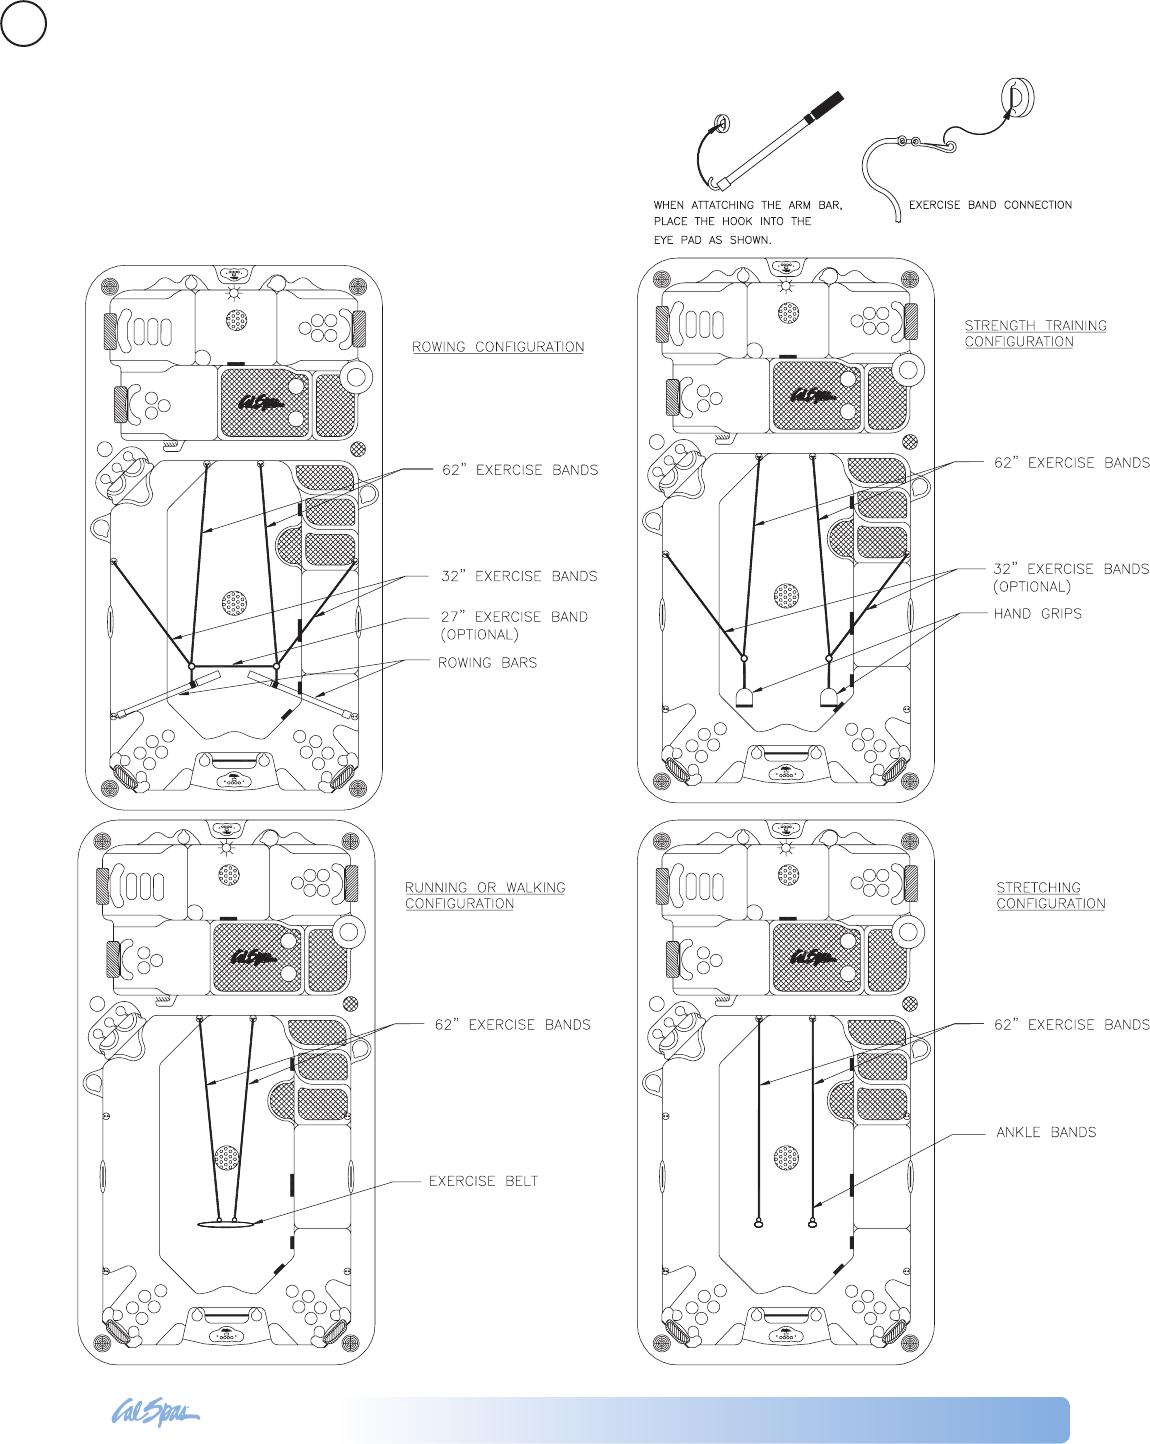 [SCHEMATICS_43NM]  Cal Spas Ltr20101001 Users Manual | Cal Spa Wiring Diagram |  | UserManual.wiki